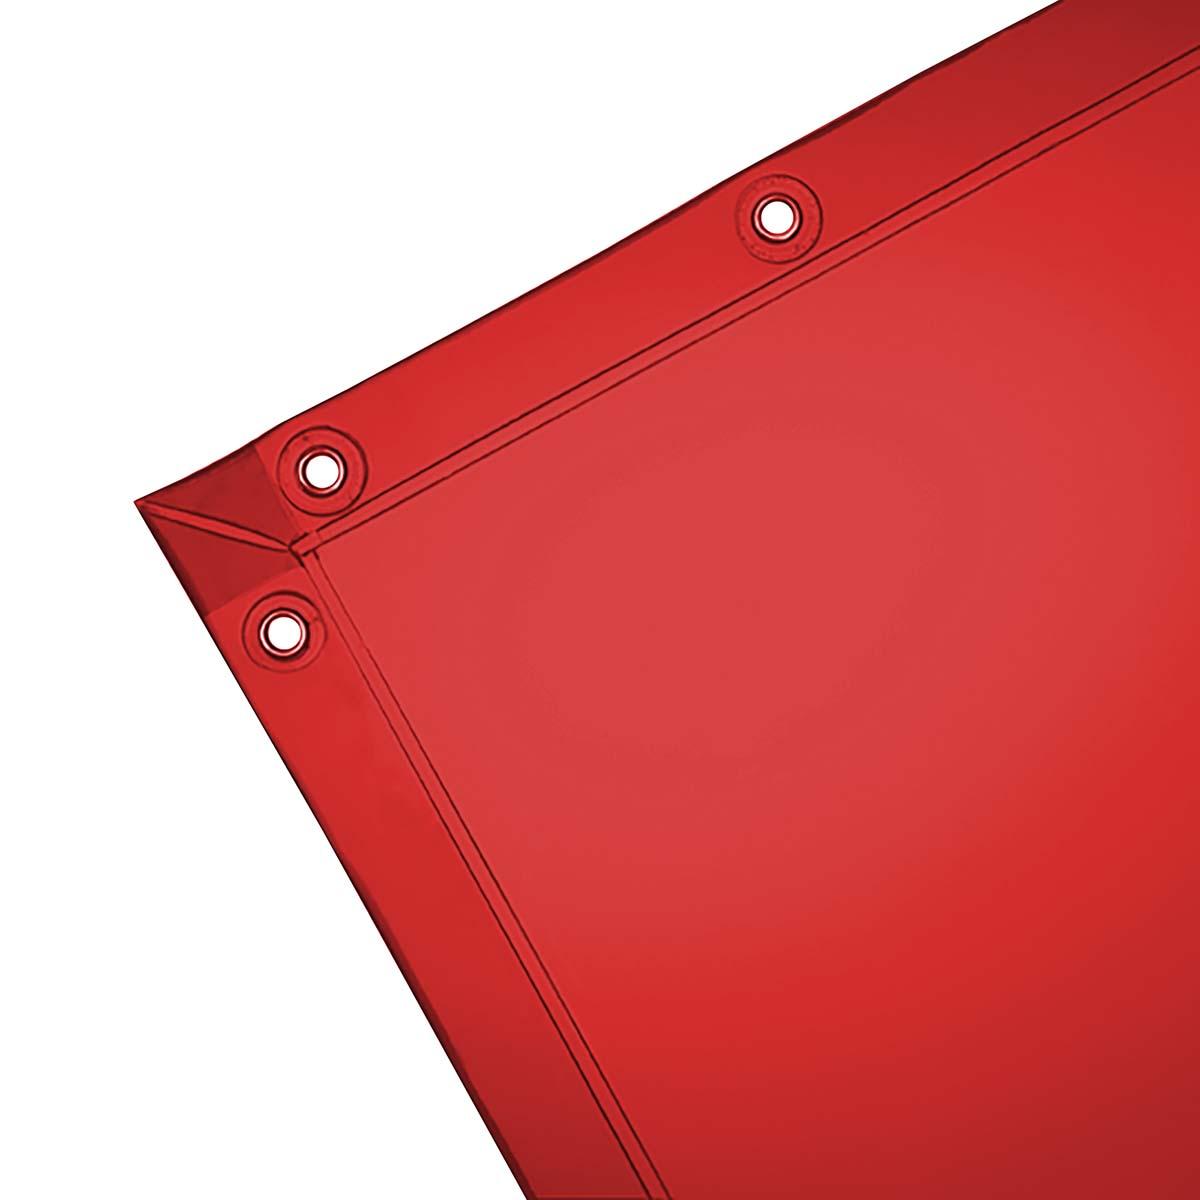 Wilson 14-Mil See-Thru Welding Curtain (36307), 6 x 8 feet, Orange Vinyl Curtain, Standard Grommets, 1 / Case